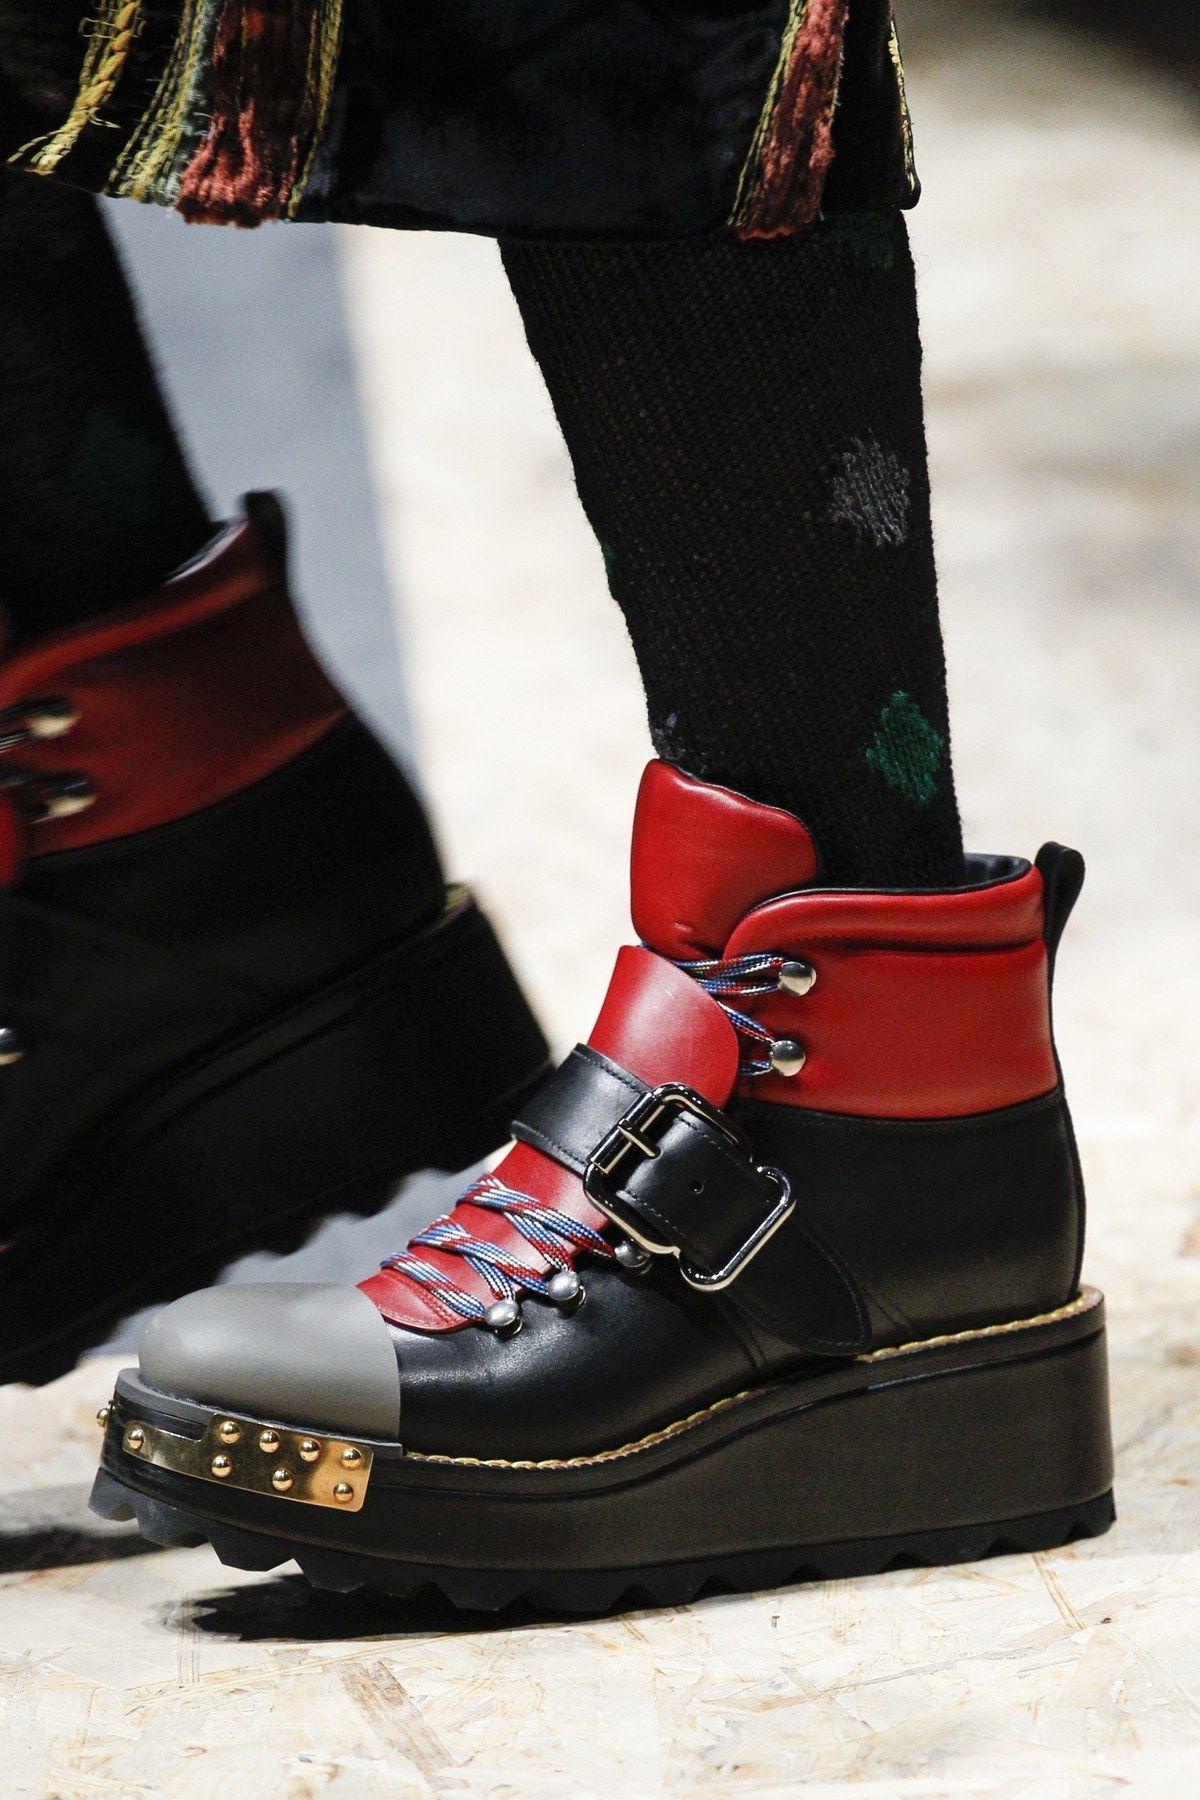 3461a5531bd 15 Most Memorable Shoes of Louis Vuitton, Vetements, Dior, and More -  Vogue. Prada